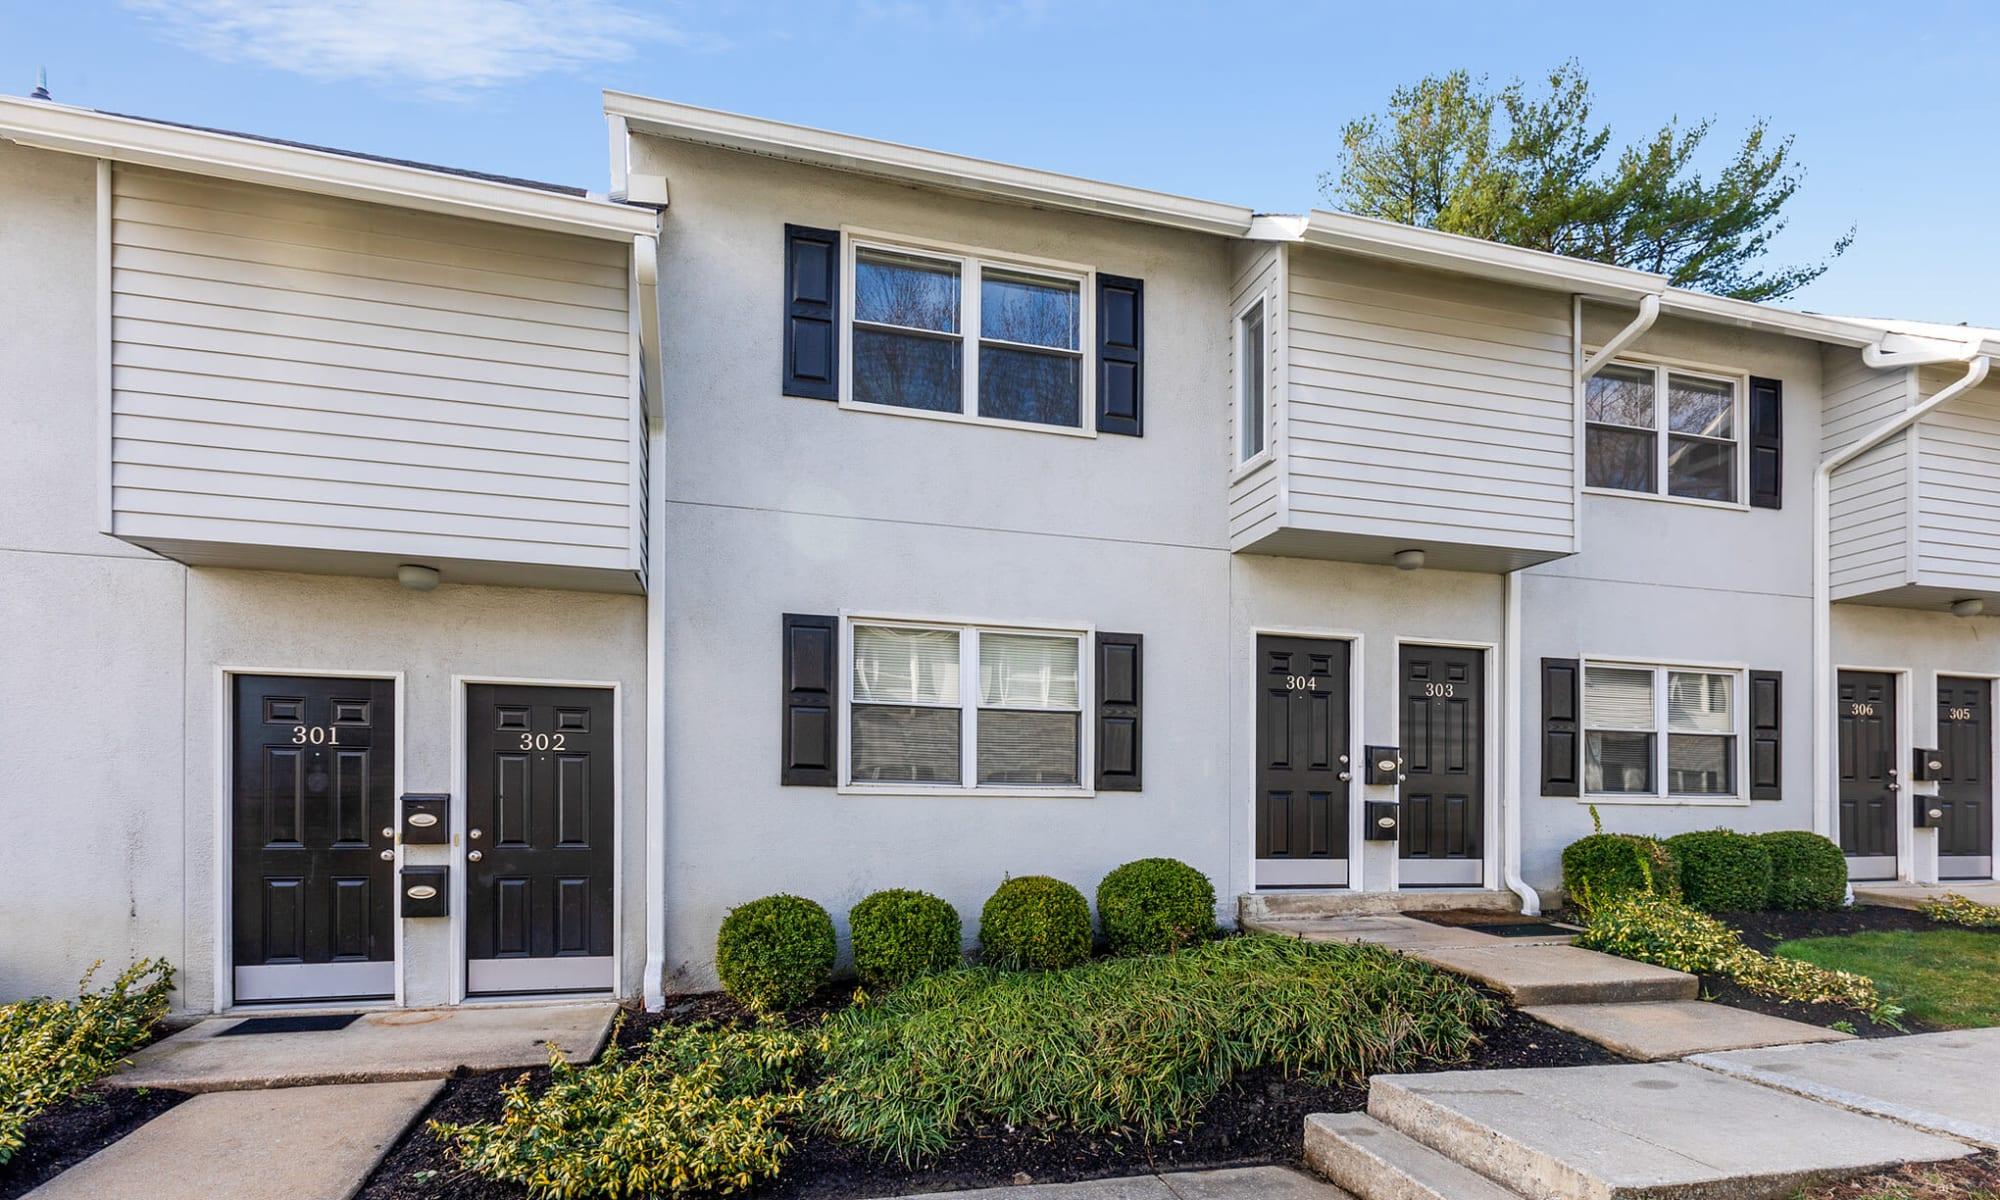 Apartments in Malvern, PA